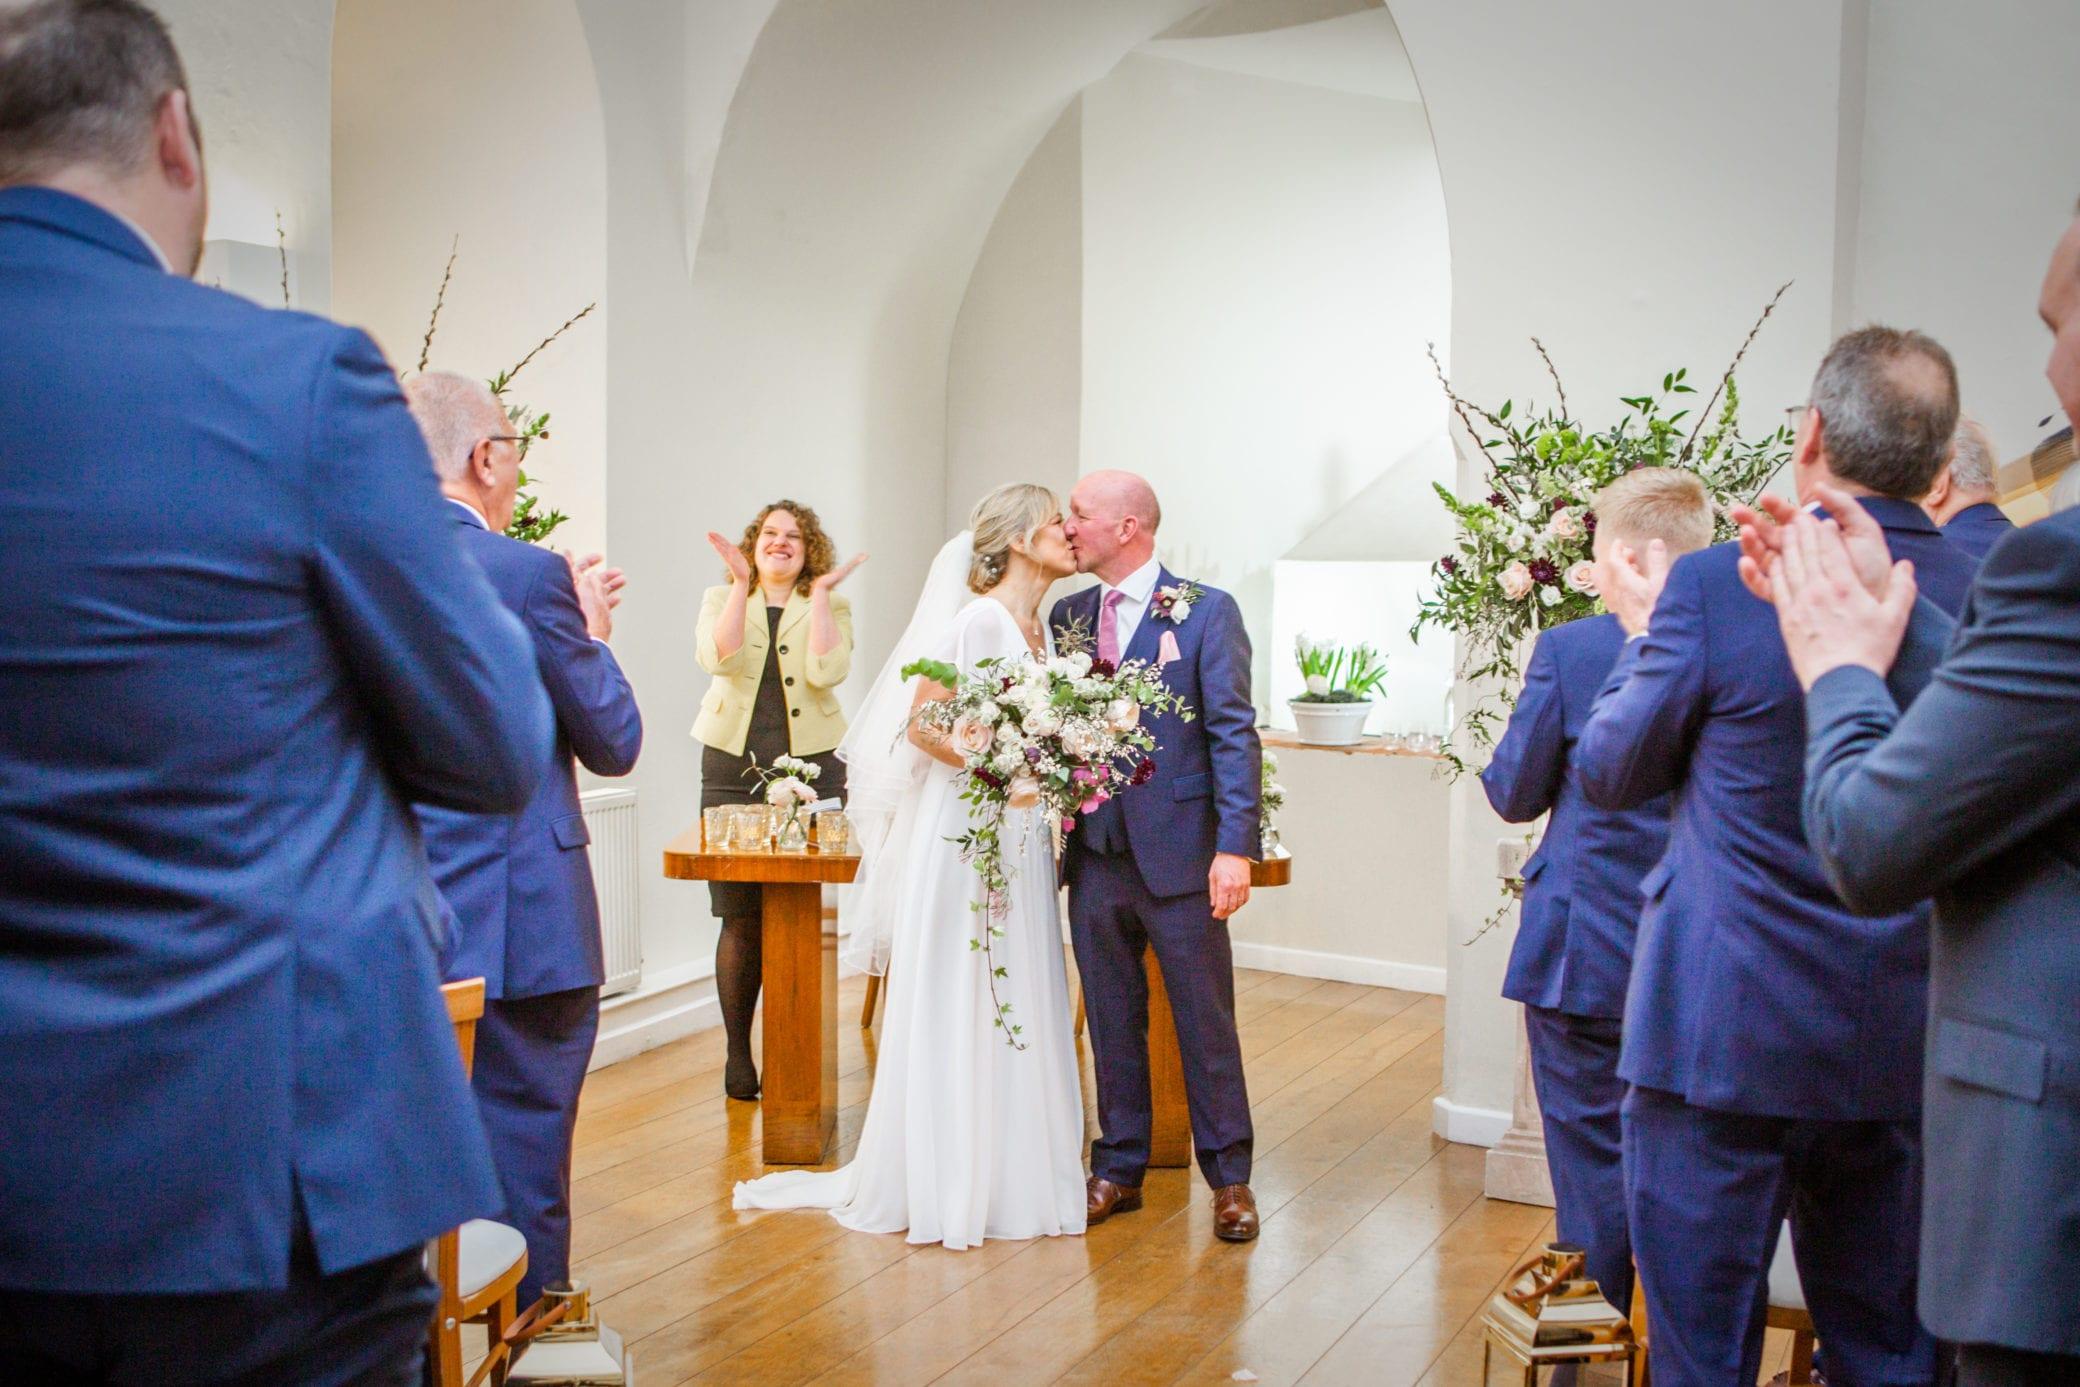 Wedding ceremony venue for older couples